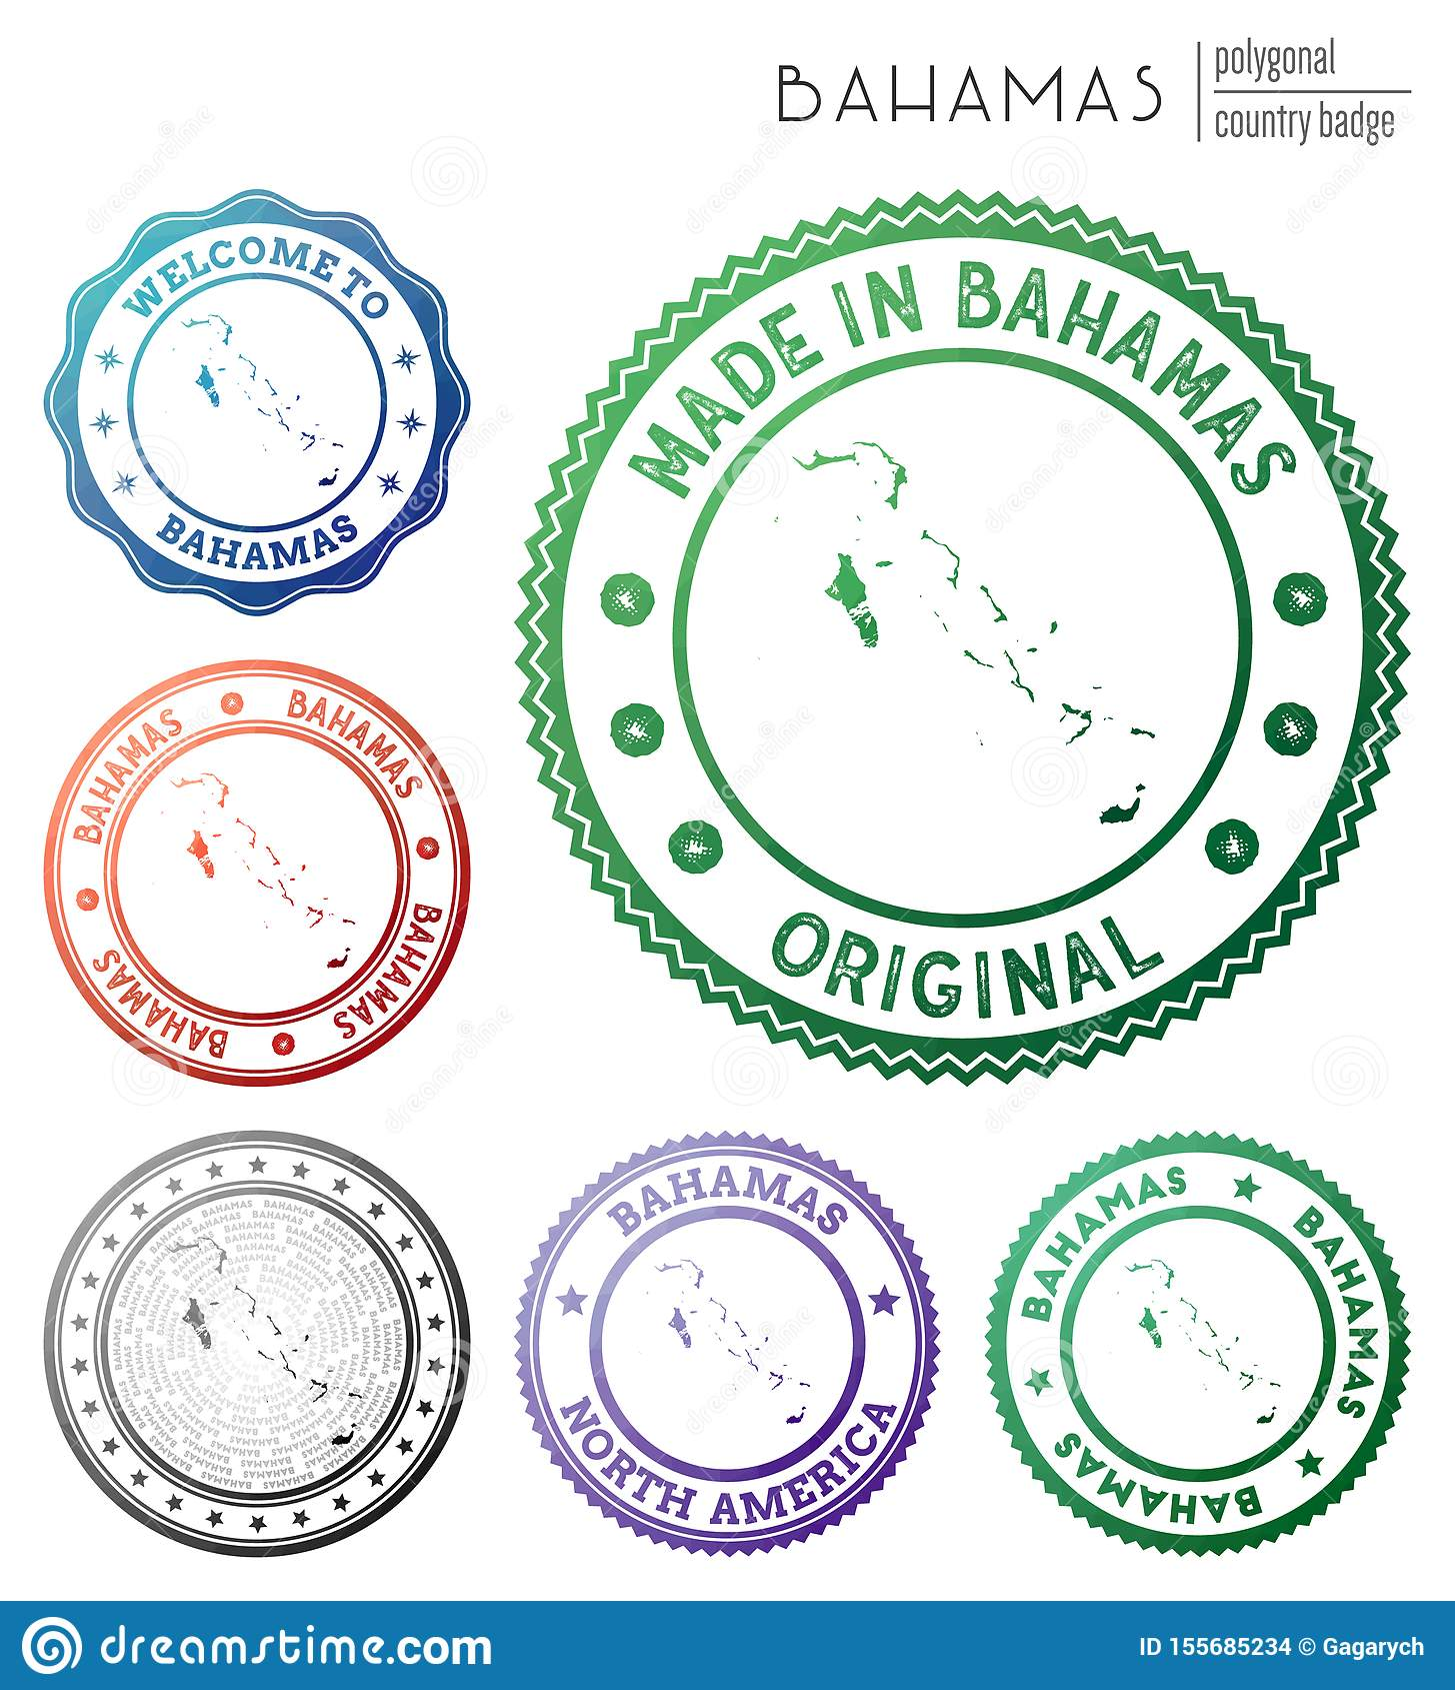 Bahamas emblem